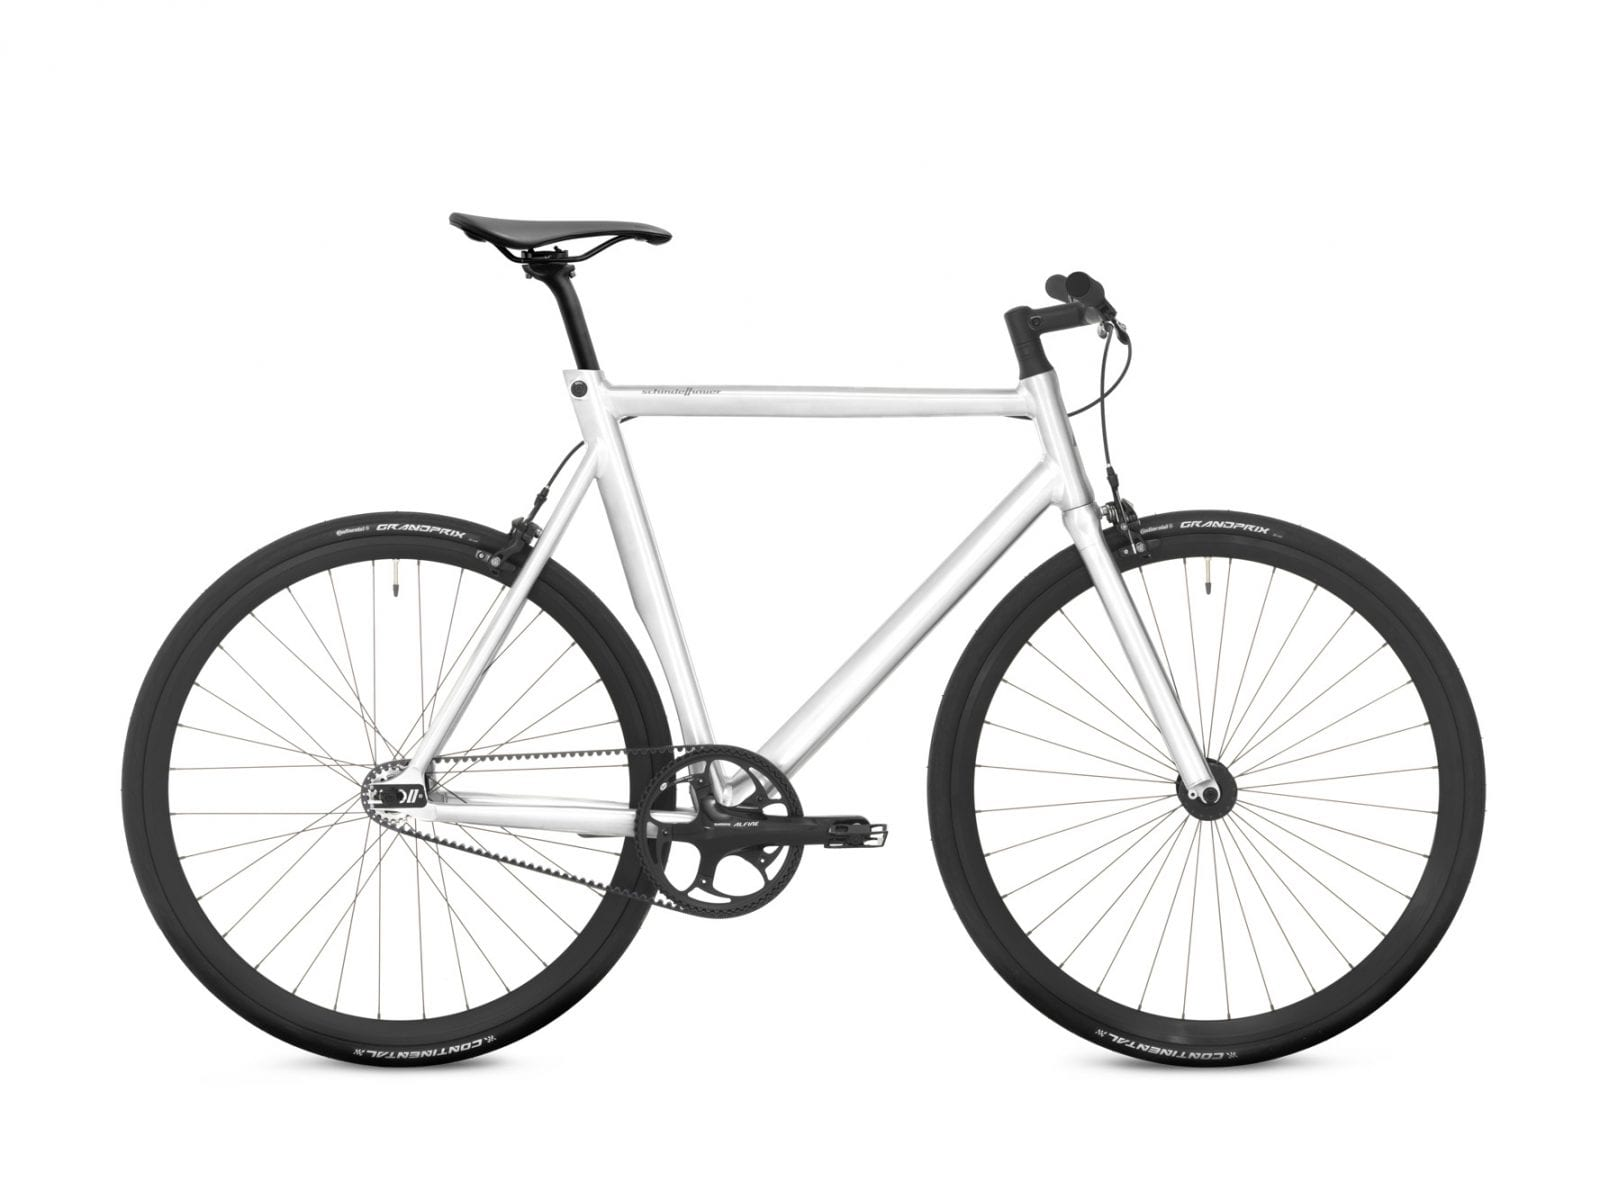 Bicicletas Schindelahuer Viktor Vuk Bikes Tienda de Bicicletas Madrid